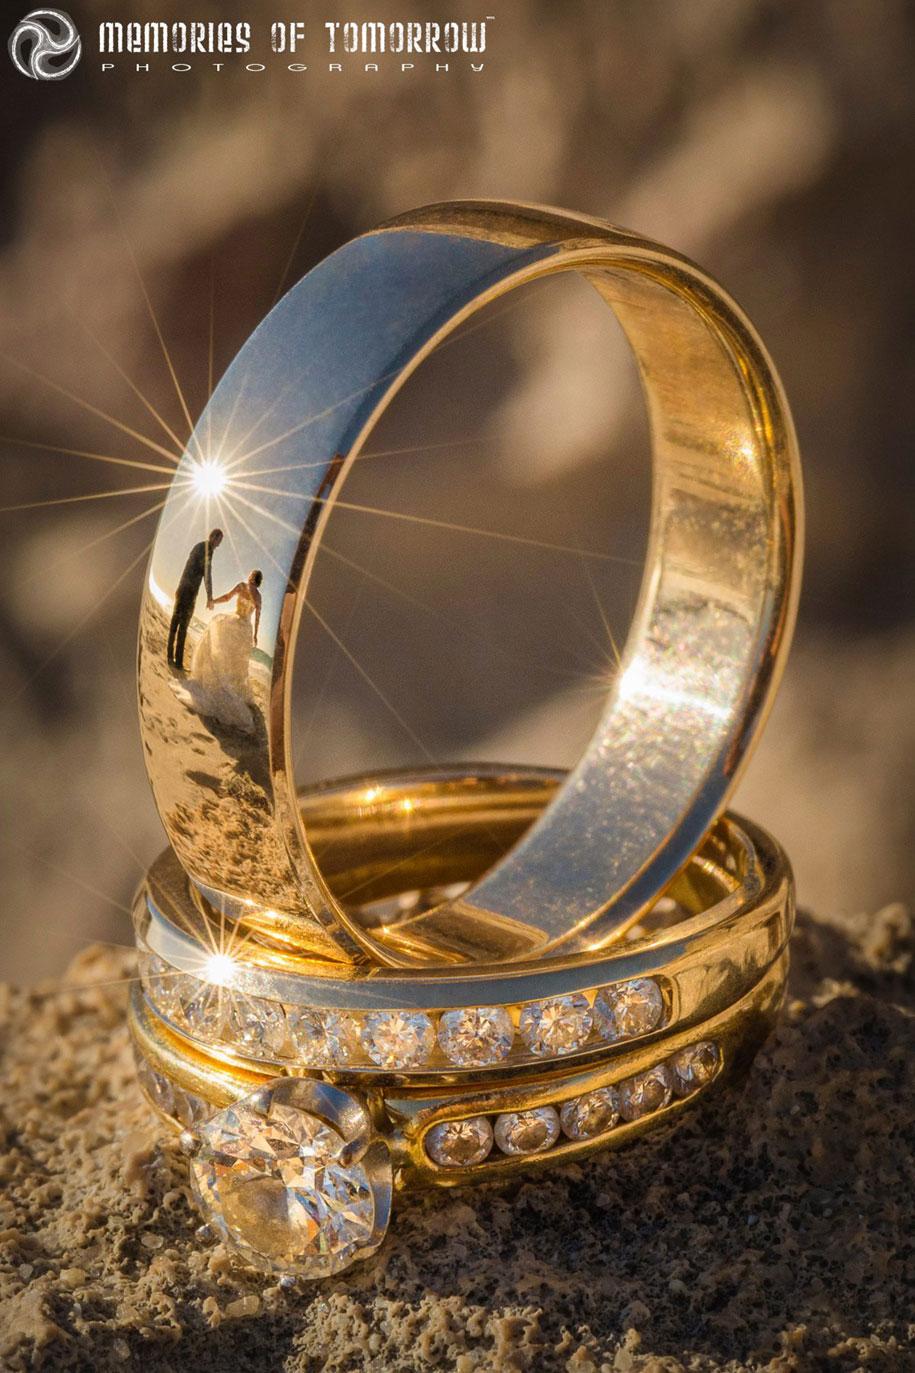 eye-reflection-wedding-photography-eyescapes-peter-adams-shawn-46